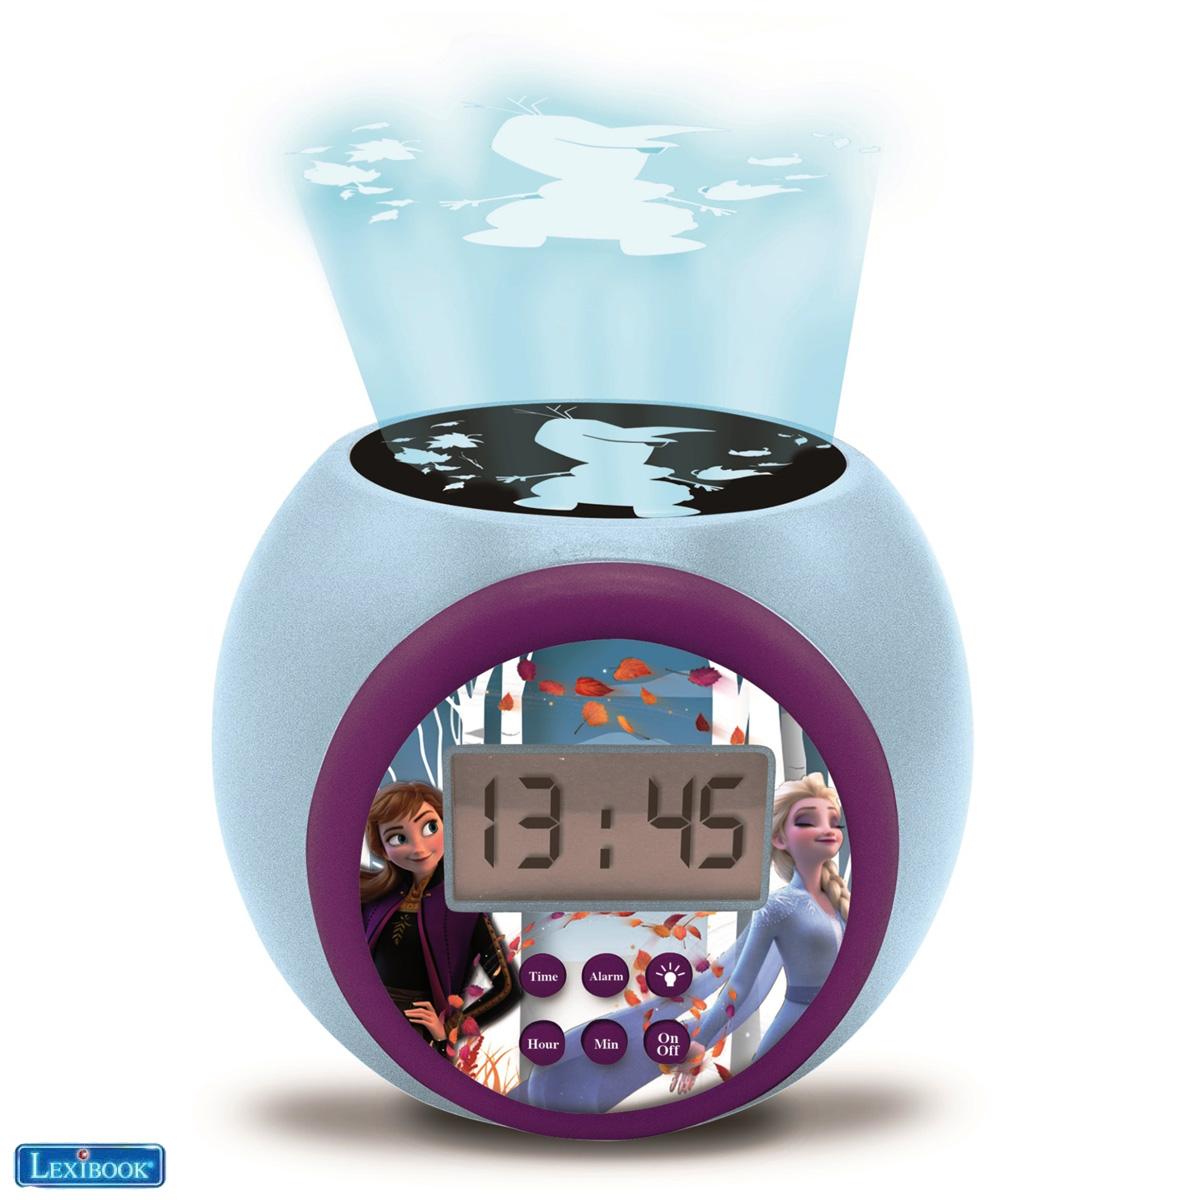 Lexibook - Frozen Projector Alarm Clock with Timer (RL977FZ)